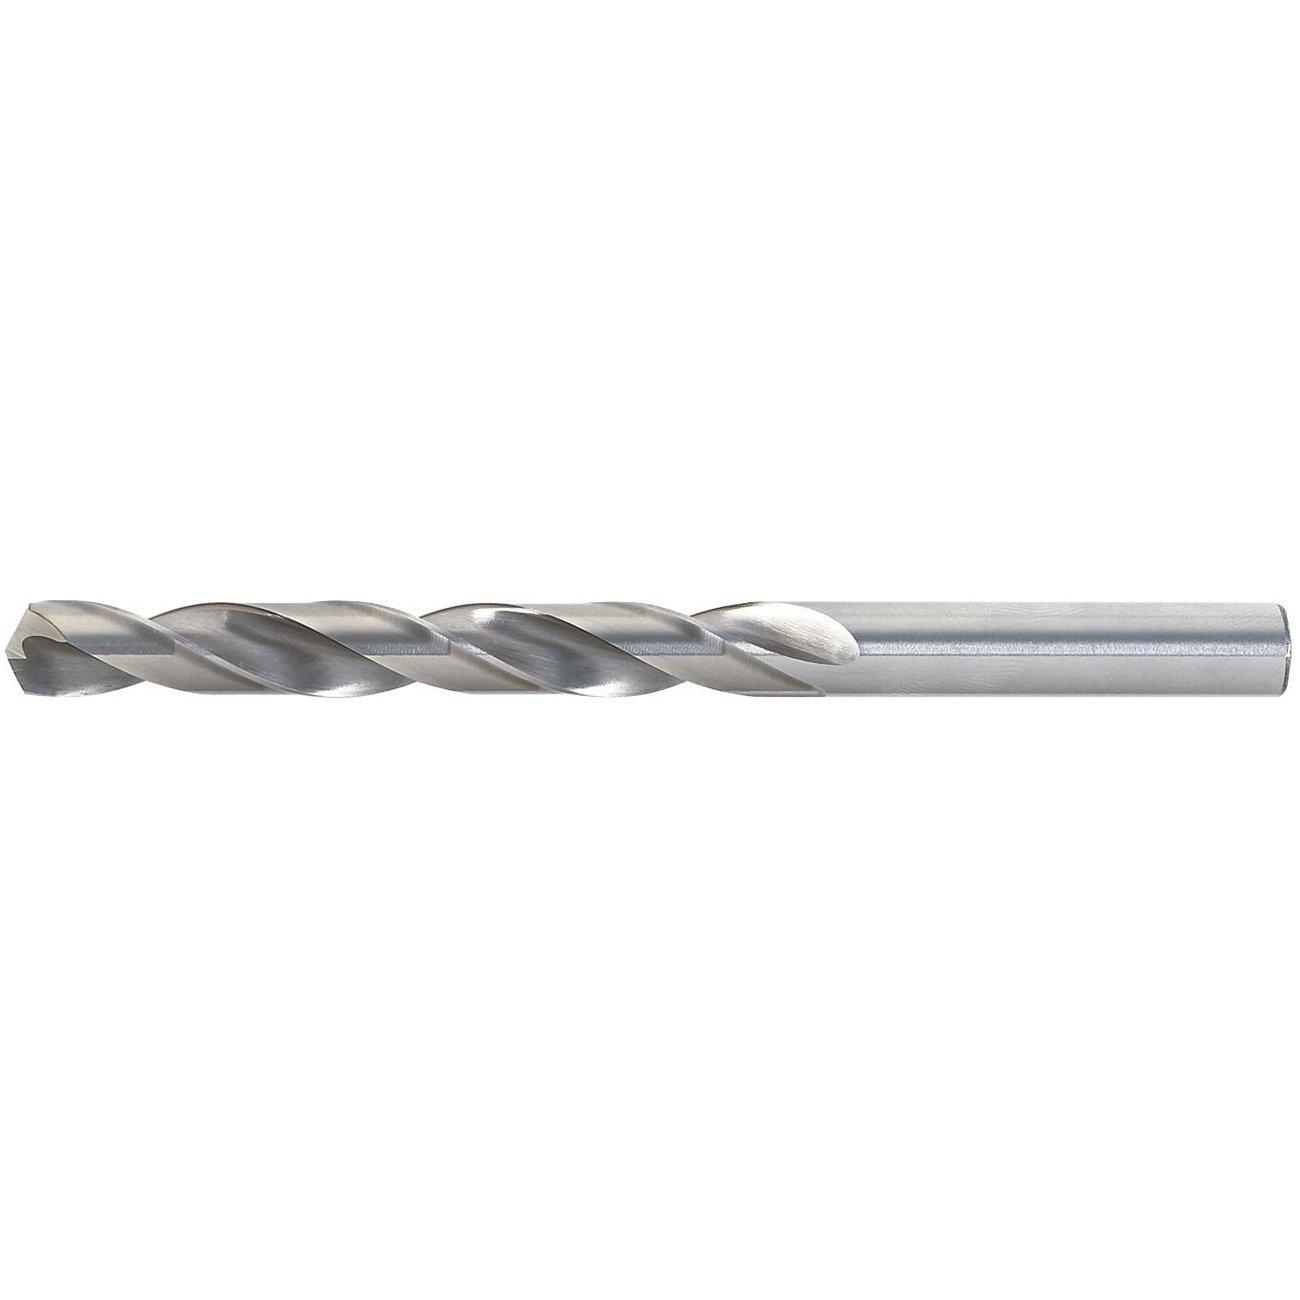 Alpen 60301111100 Morse Taper Shank Drills Hss-Eco Din 338 Rn 11 11mm 7//16